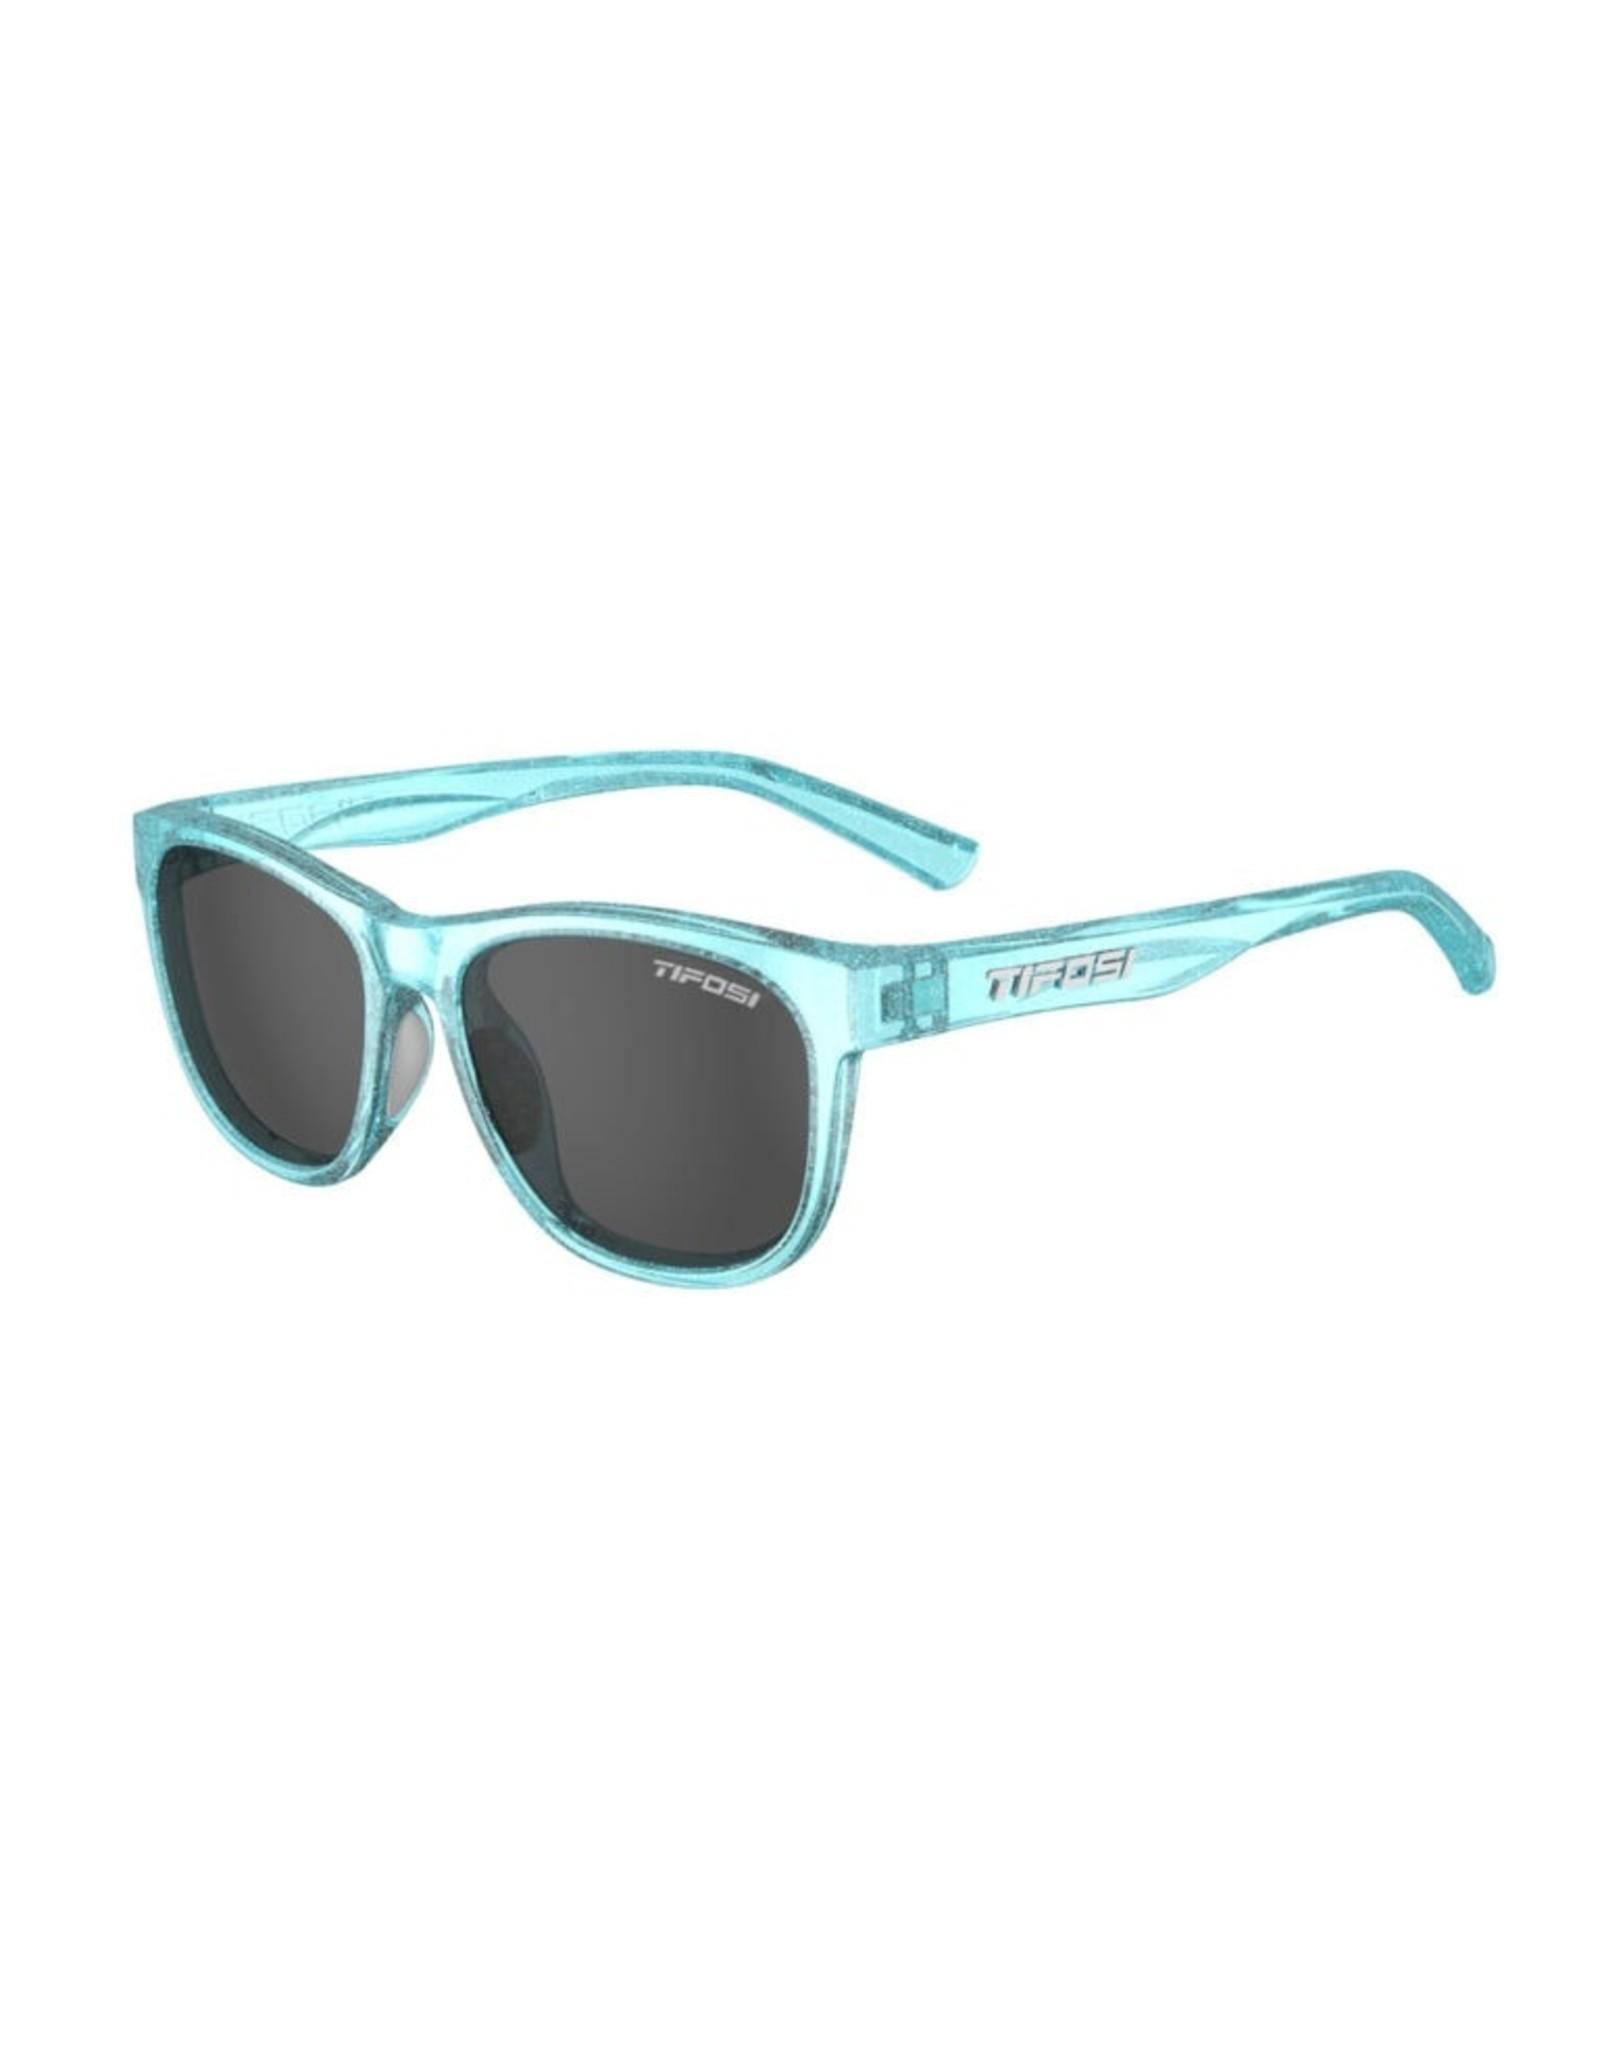 Tifosi Optics Smoke, Swank Glitter, Mermaid Blue Single Lens Sunglasses. Type: Single Lens